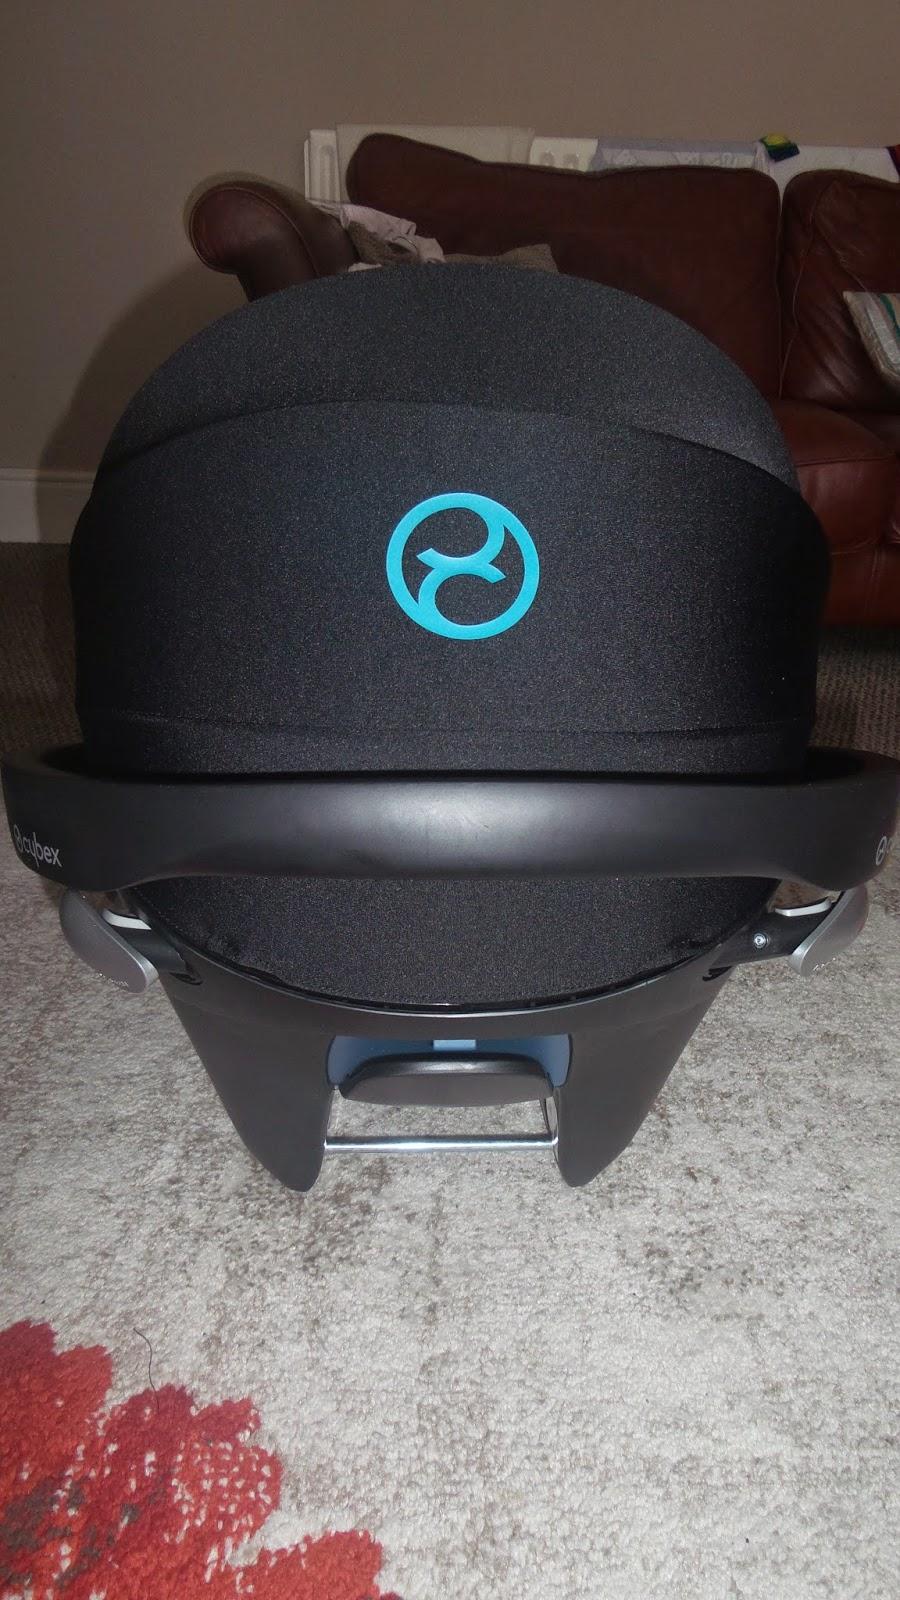 carsonsmummy blog review, CYBEX ATON Q, Sun visor, LSP System